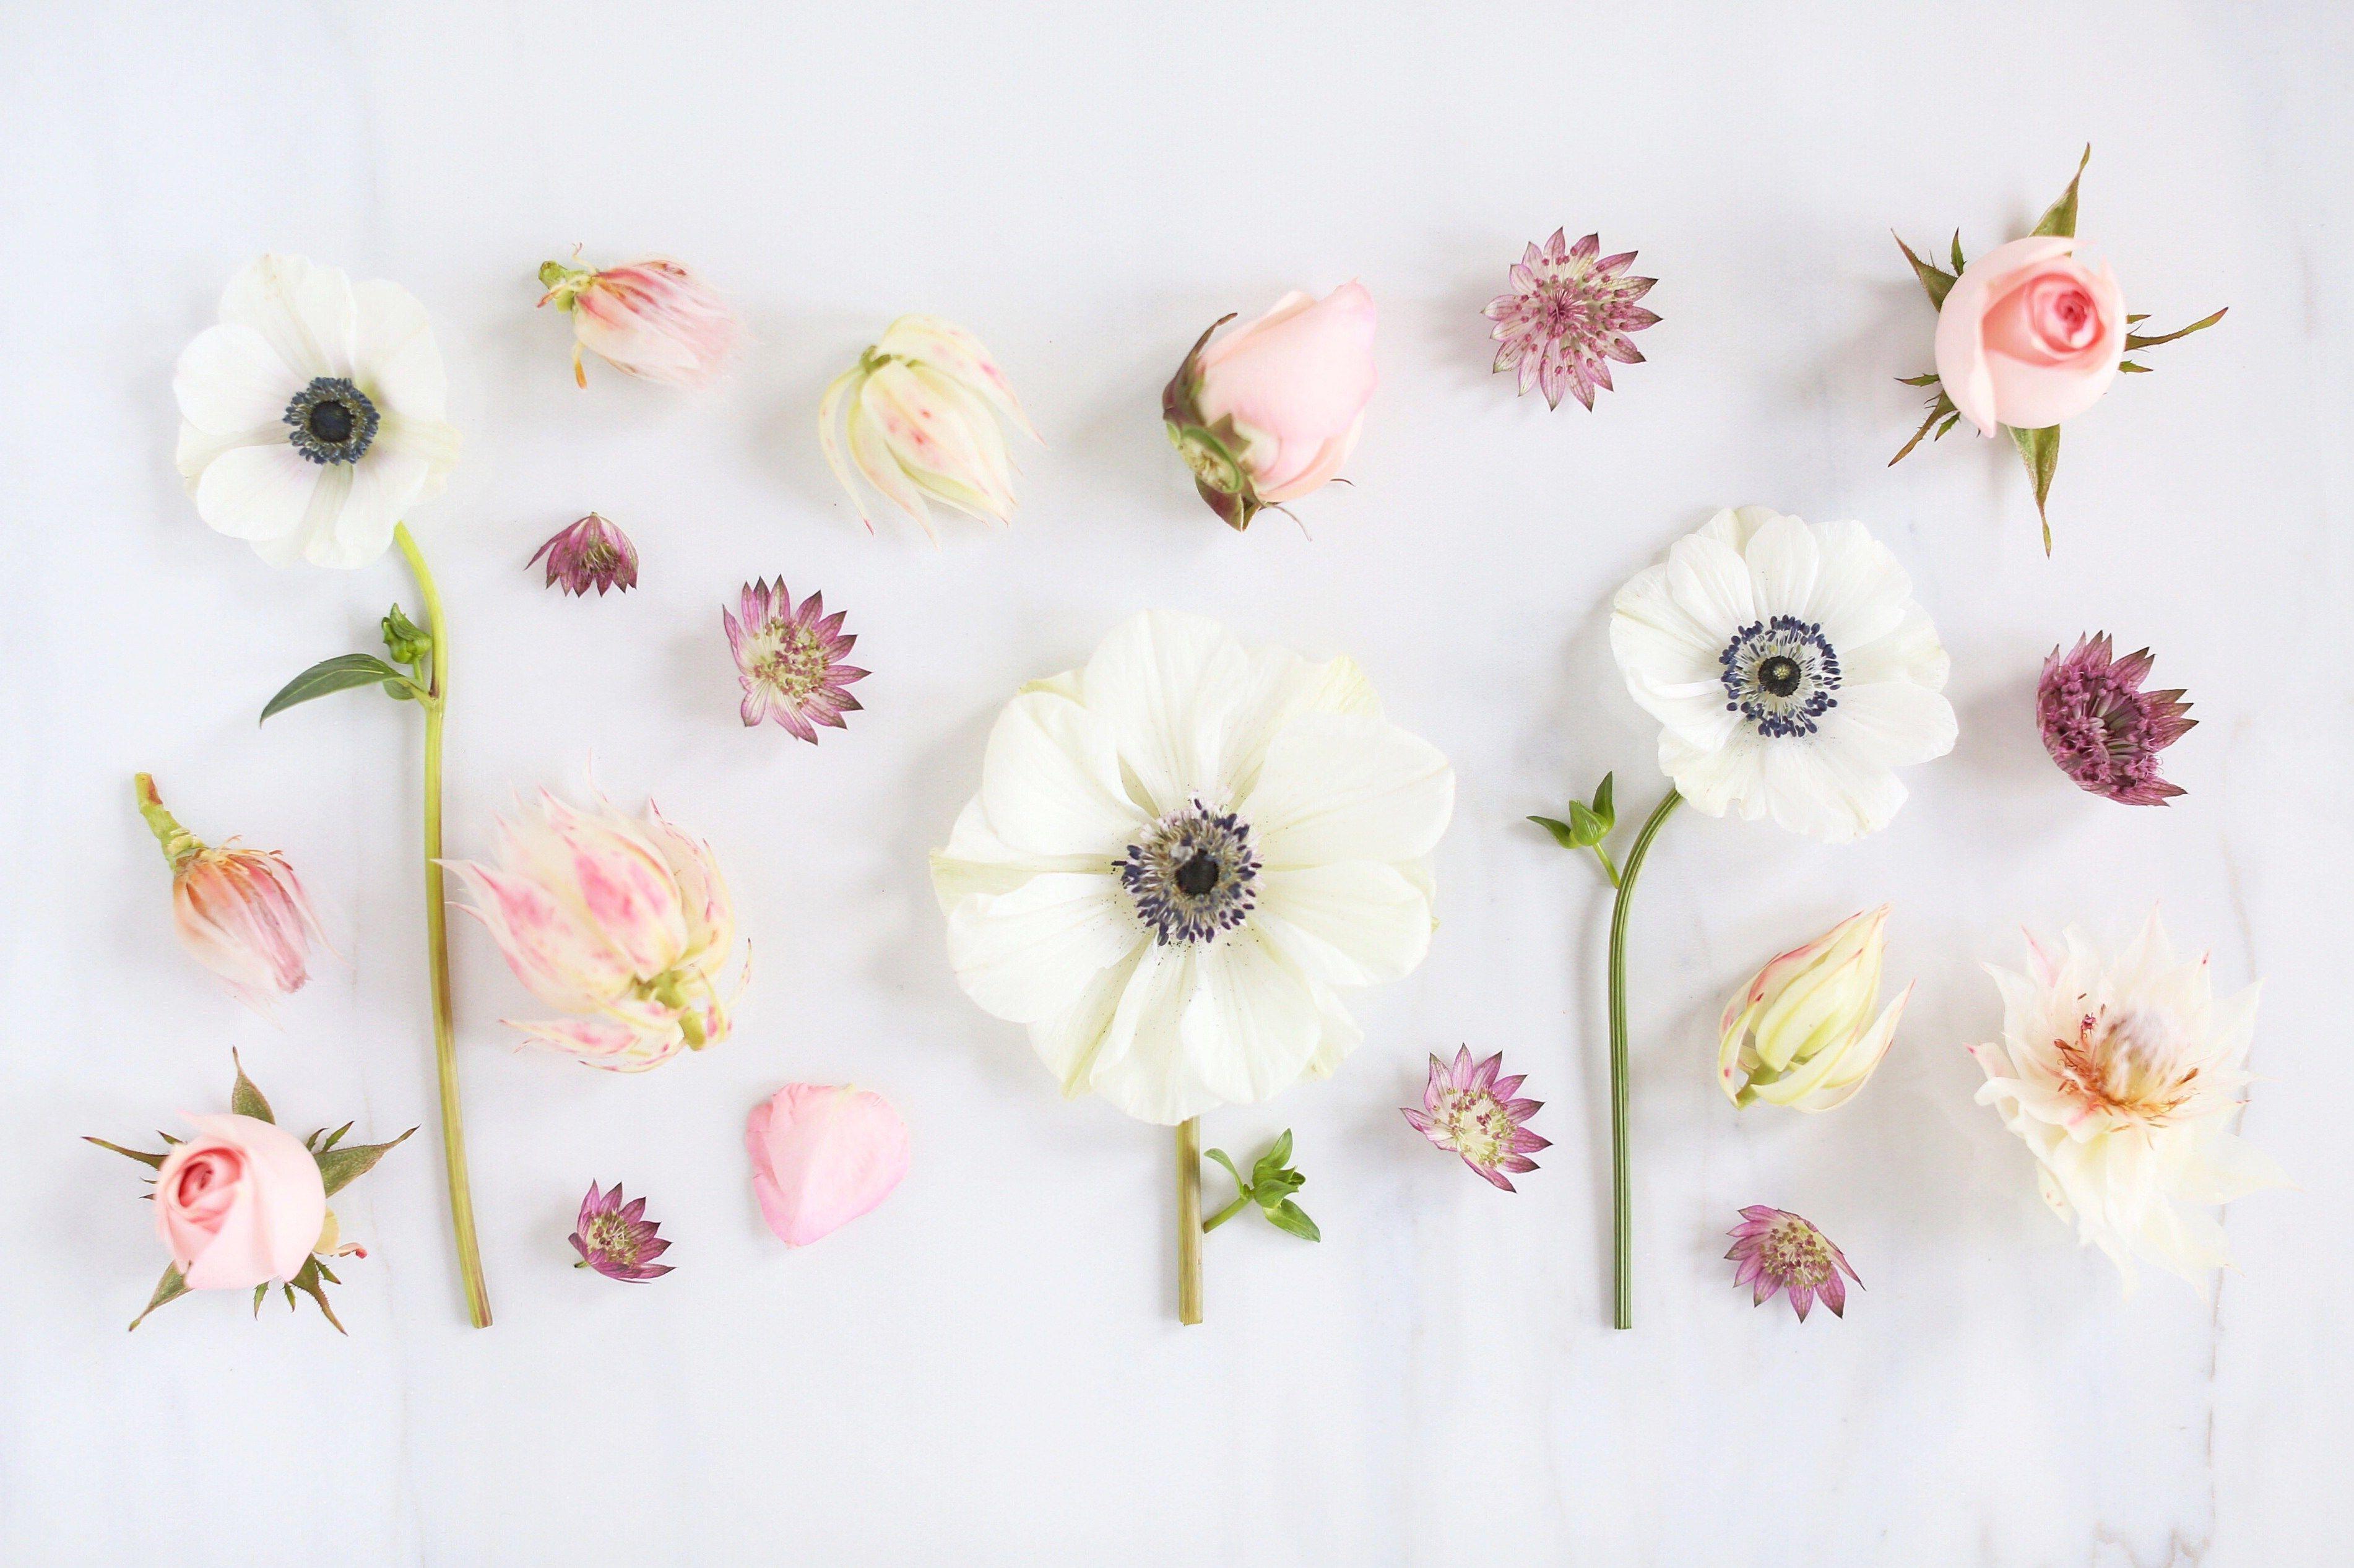 Aesthetic Flower Desktop Wallpapers Top Free Aesthetic Flower Desktop Backgrounds Wallpaperaccess